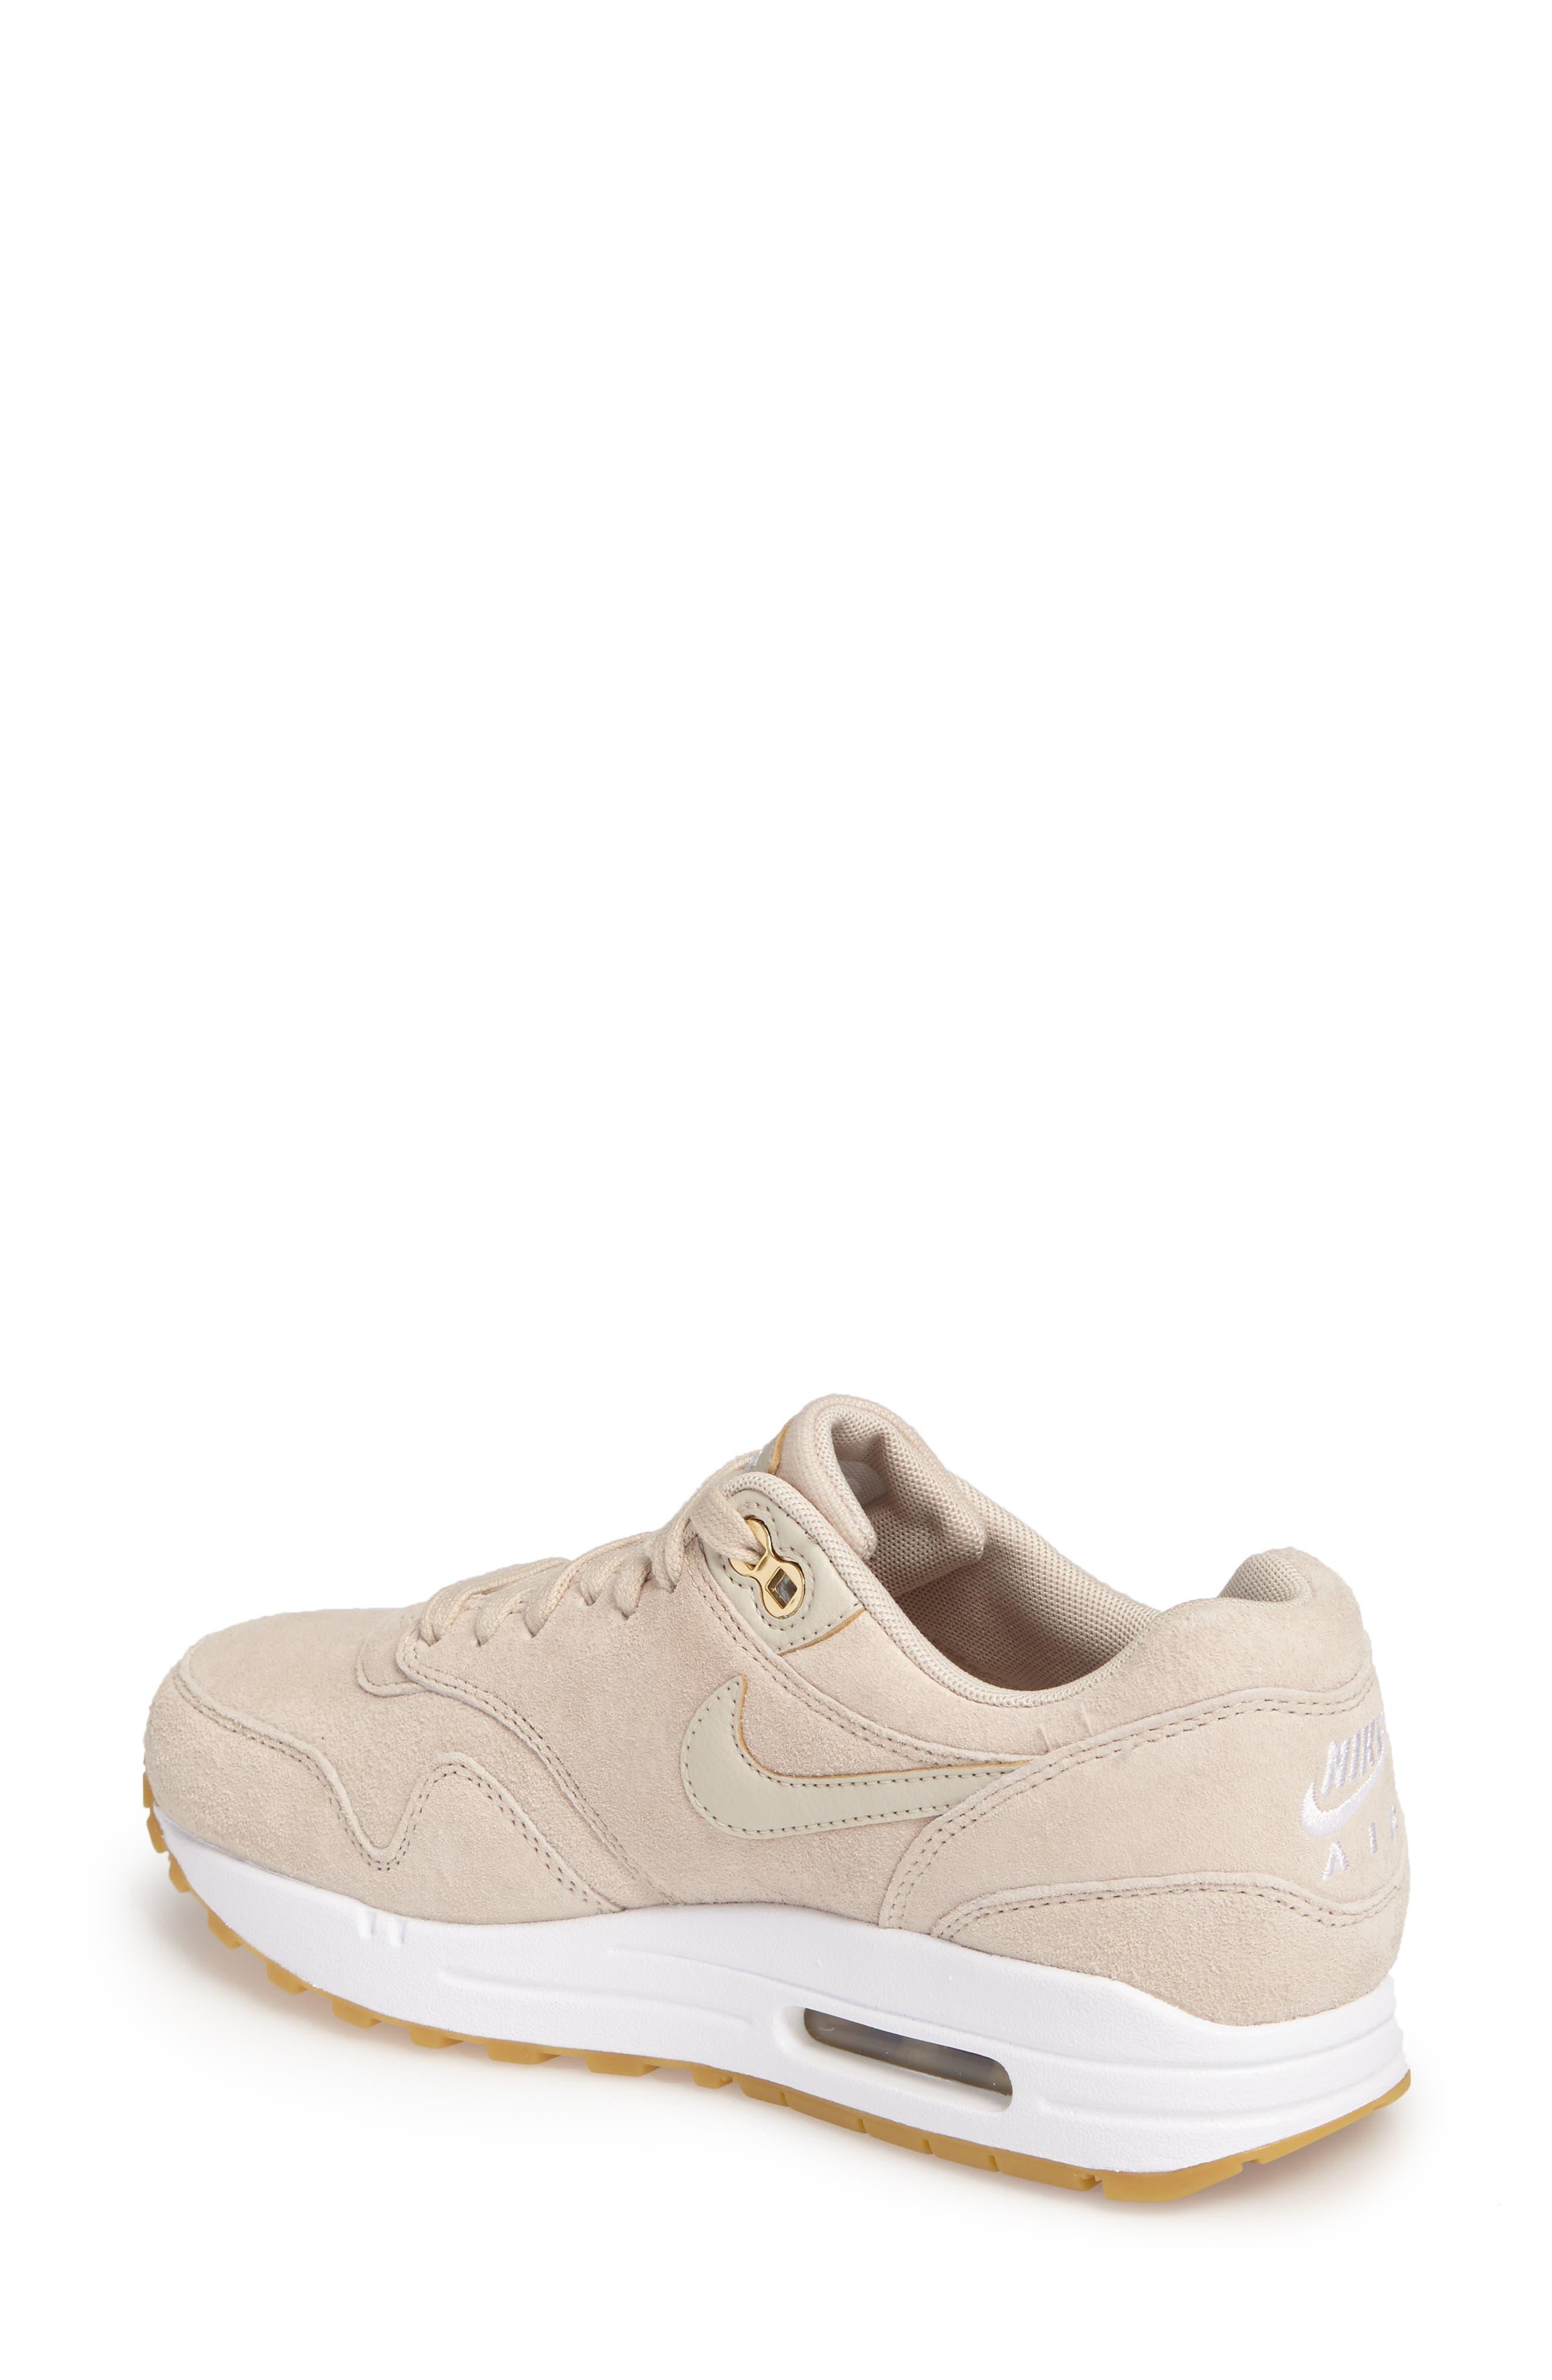 Air Max 1 SD Sneaker,                             Alternate thumbnail 2, color,                             250